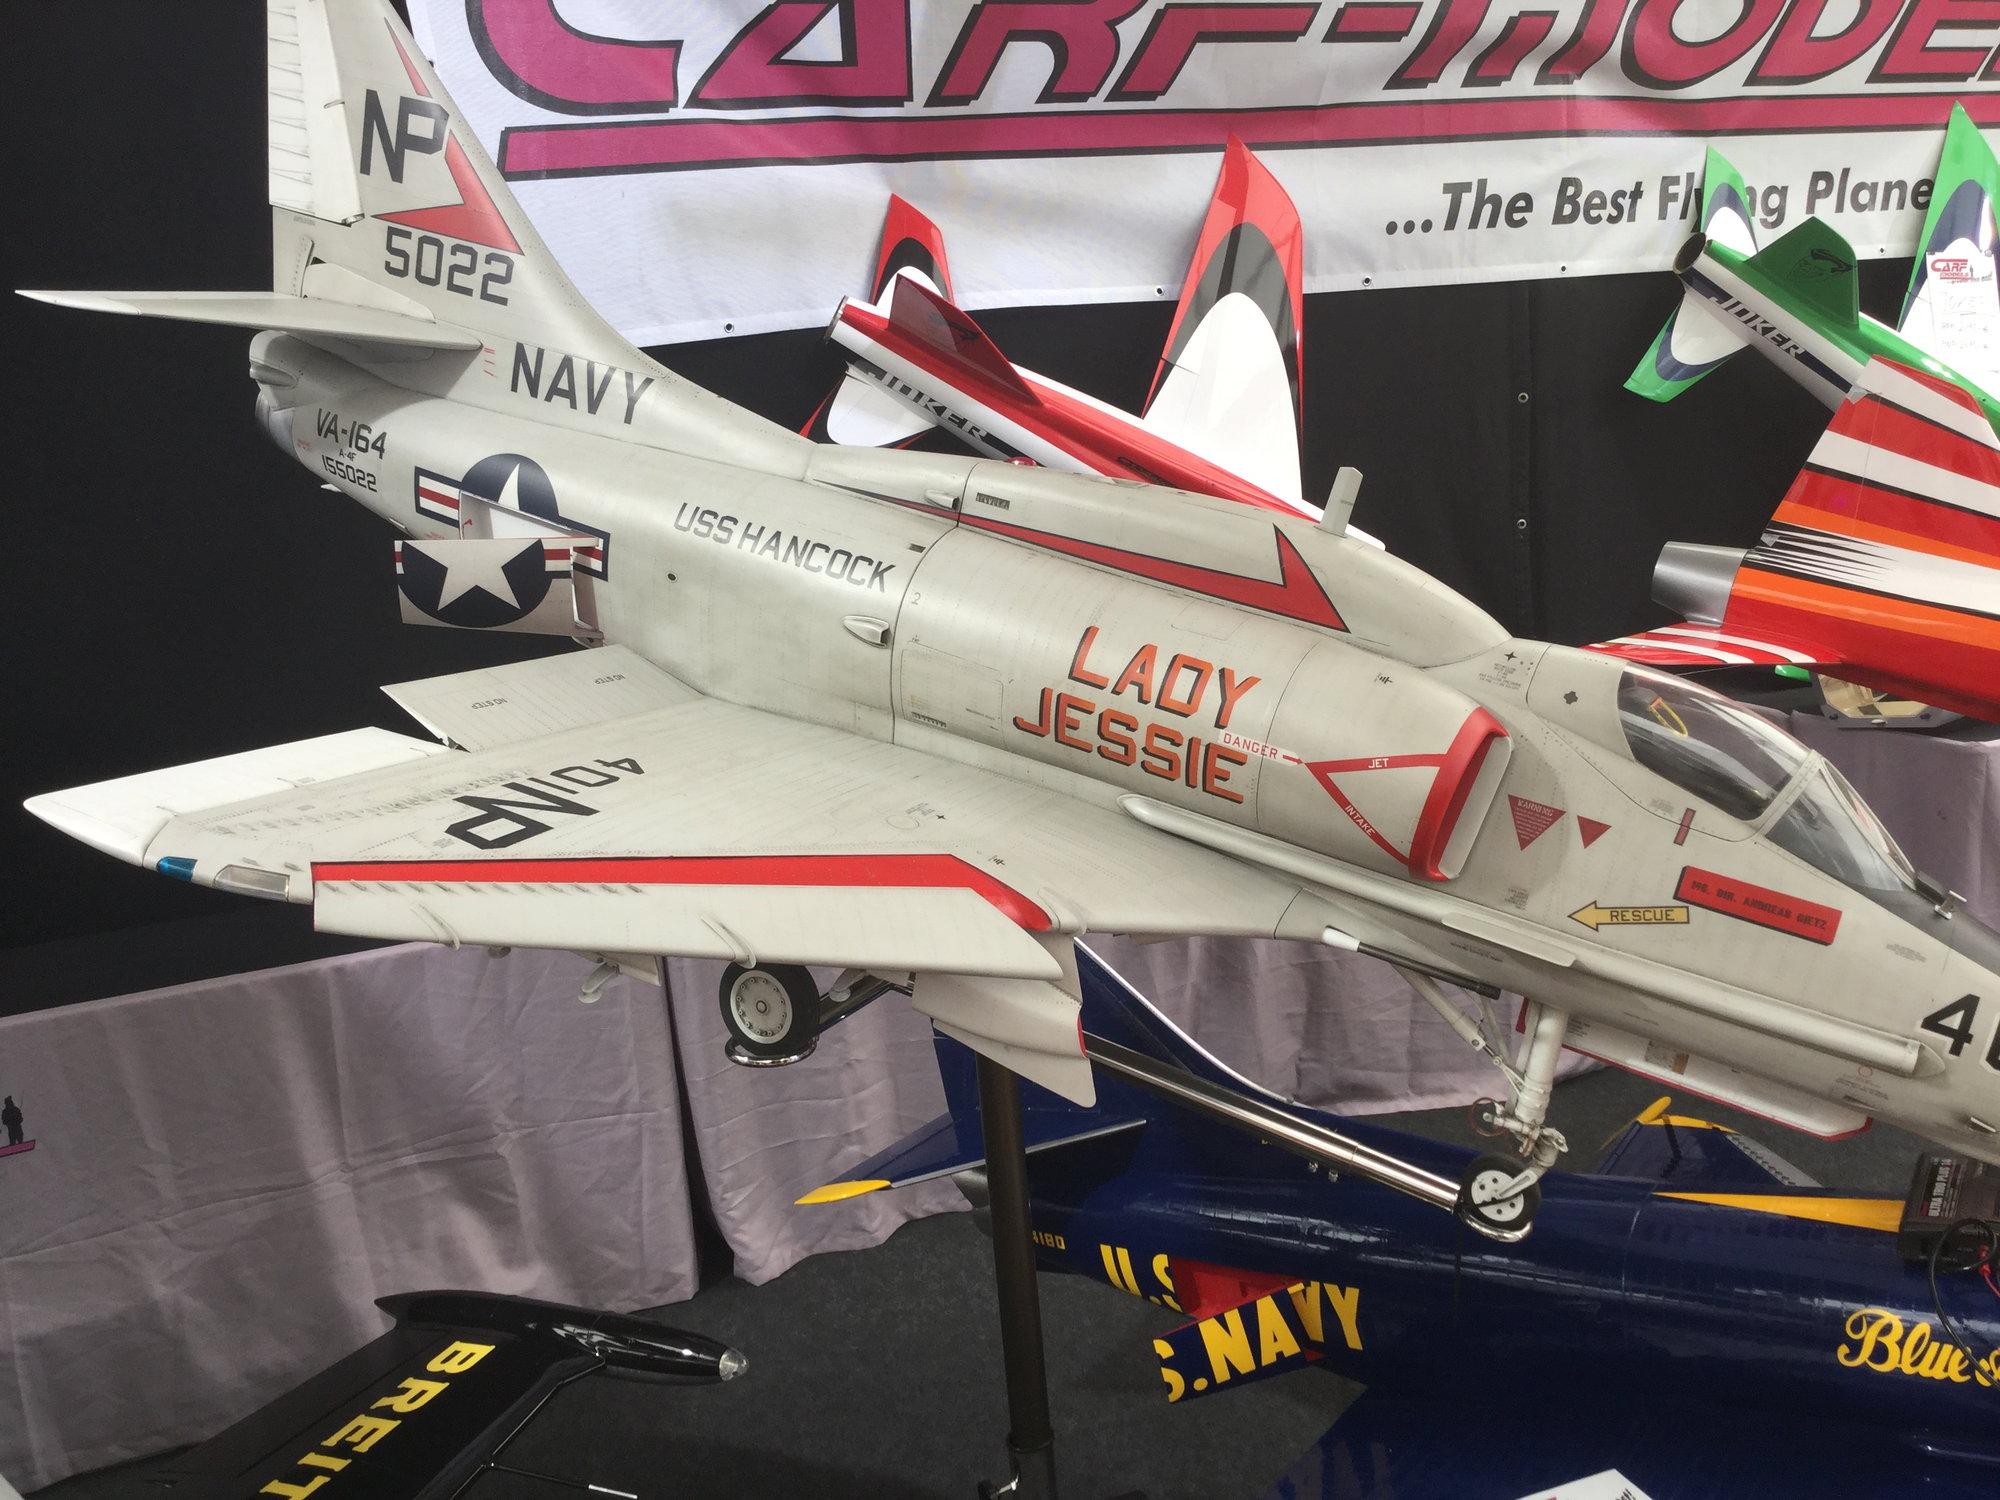 Jetpower 2018 - Page 4 - RCU Forums